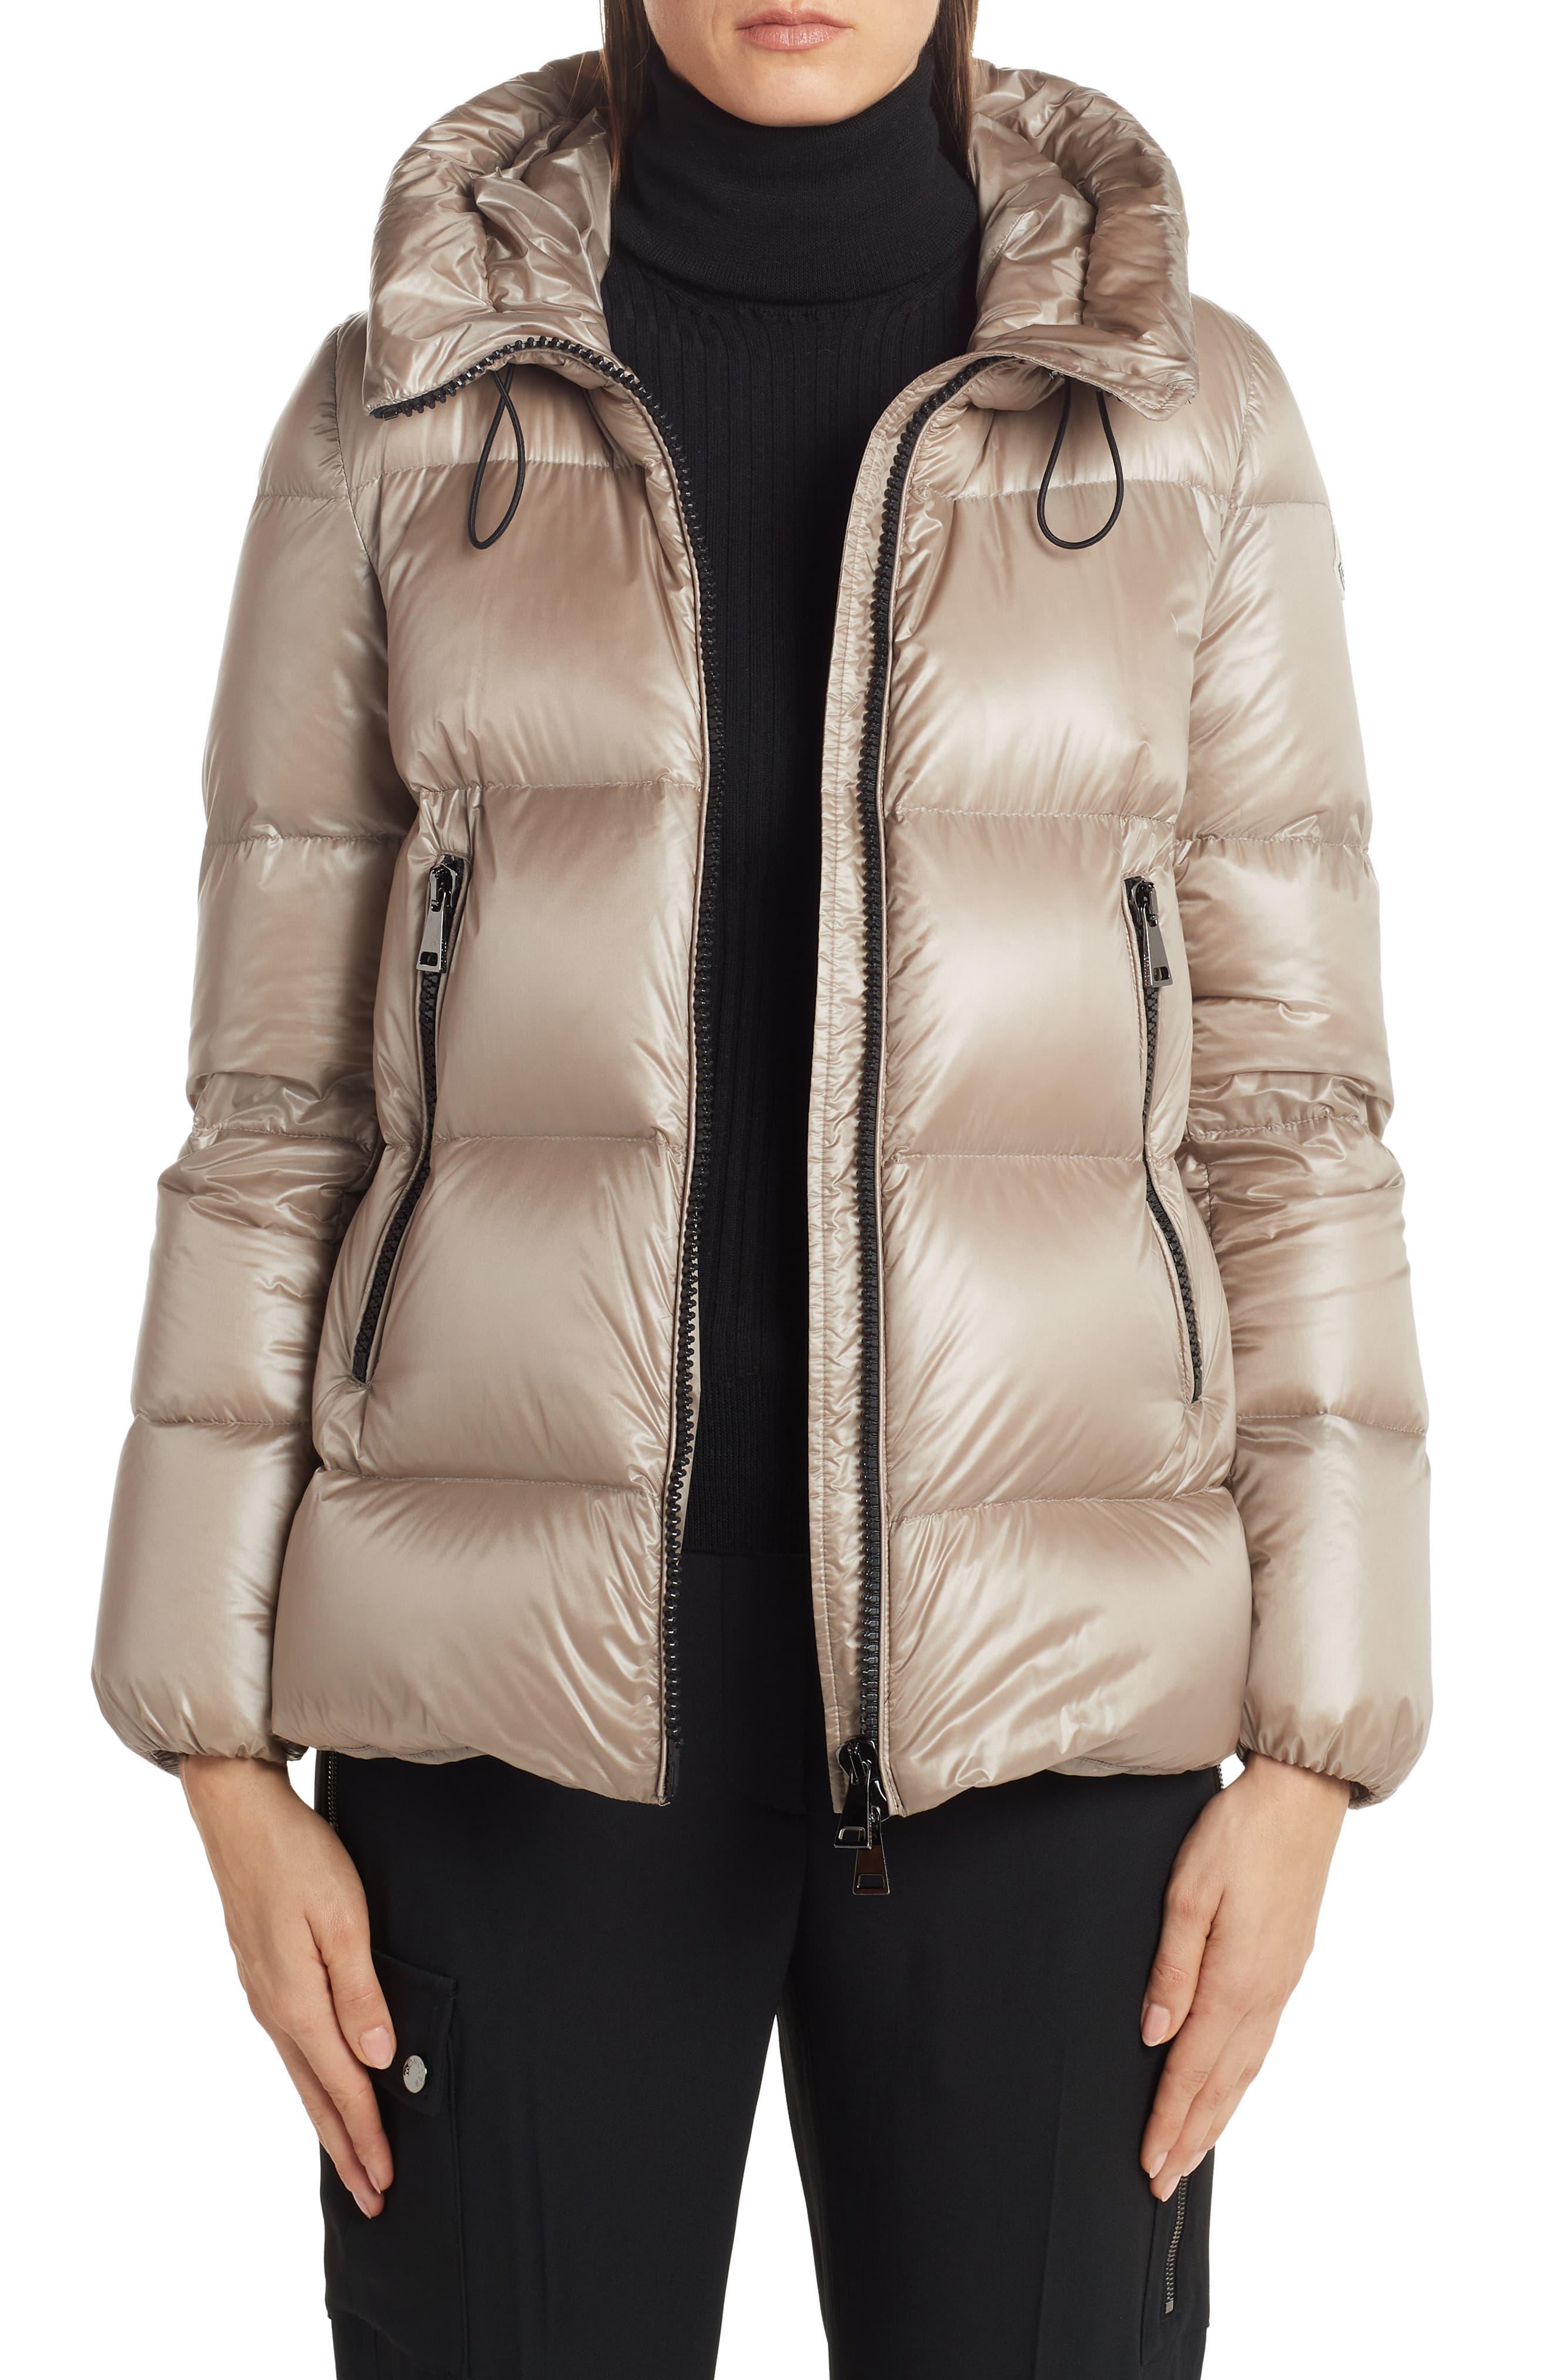 Quilted SILK Jacket Print Windbreaker jacket Belt up jacket Lightweight Bomber Jacket Coat # 04 Womens Kimono Jacket Quilted Robe